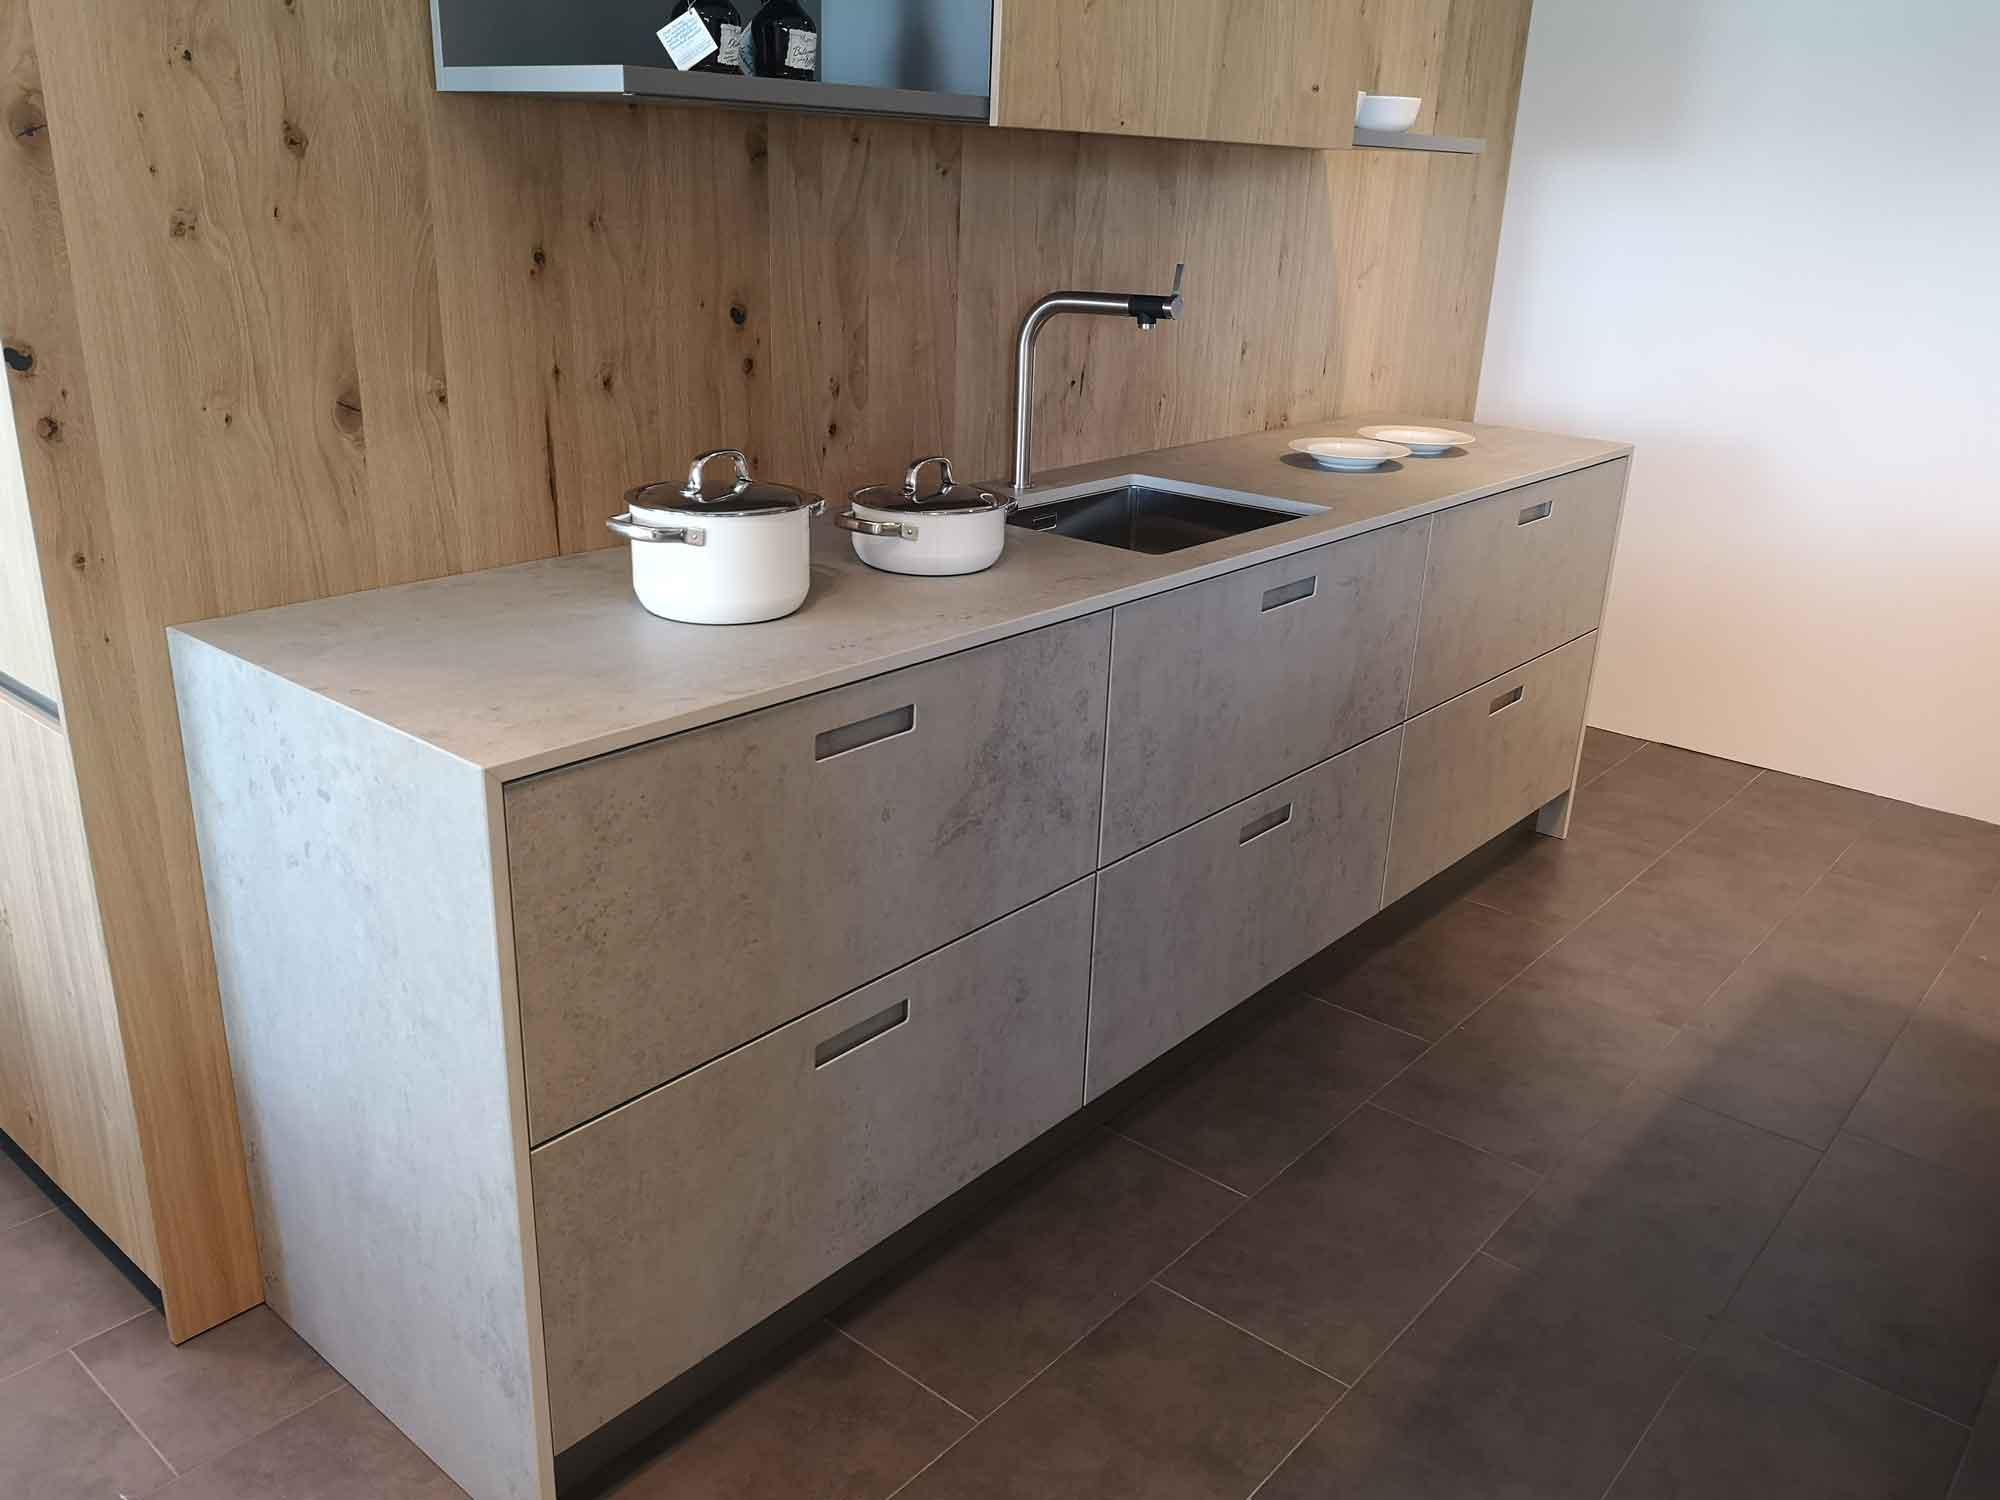 neolith beton arbeitsplatte beton arbeitsplatten beton k chenarbeitsplatten beton. Black Bedroom Furniture Sets. Home Design Ideas